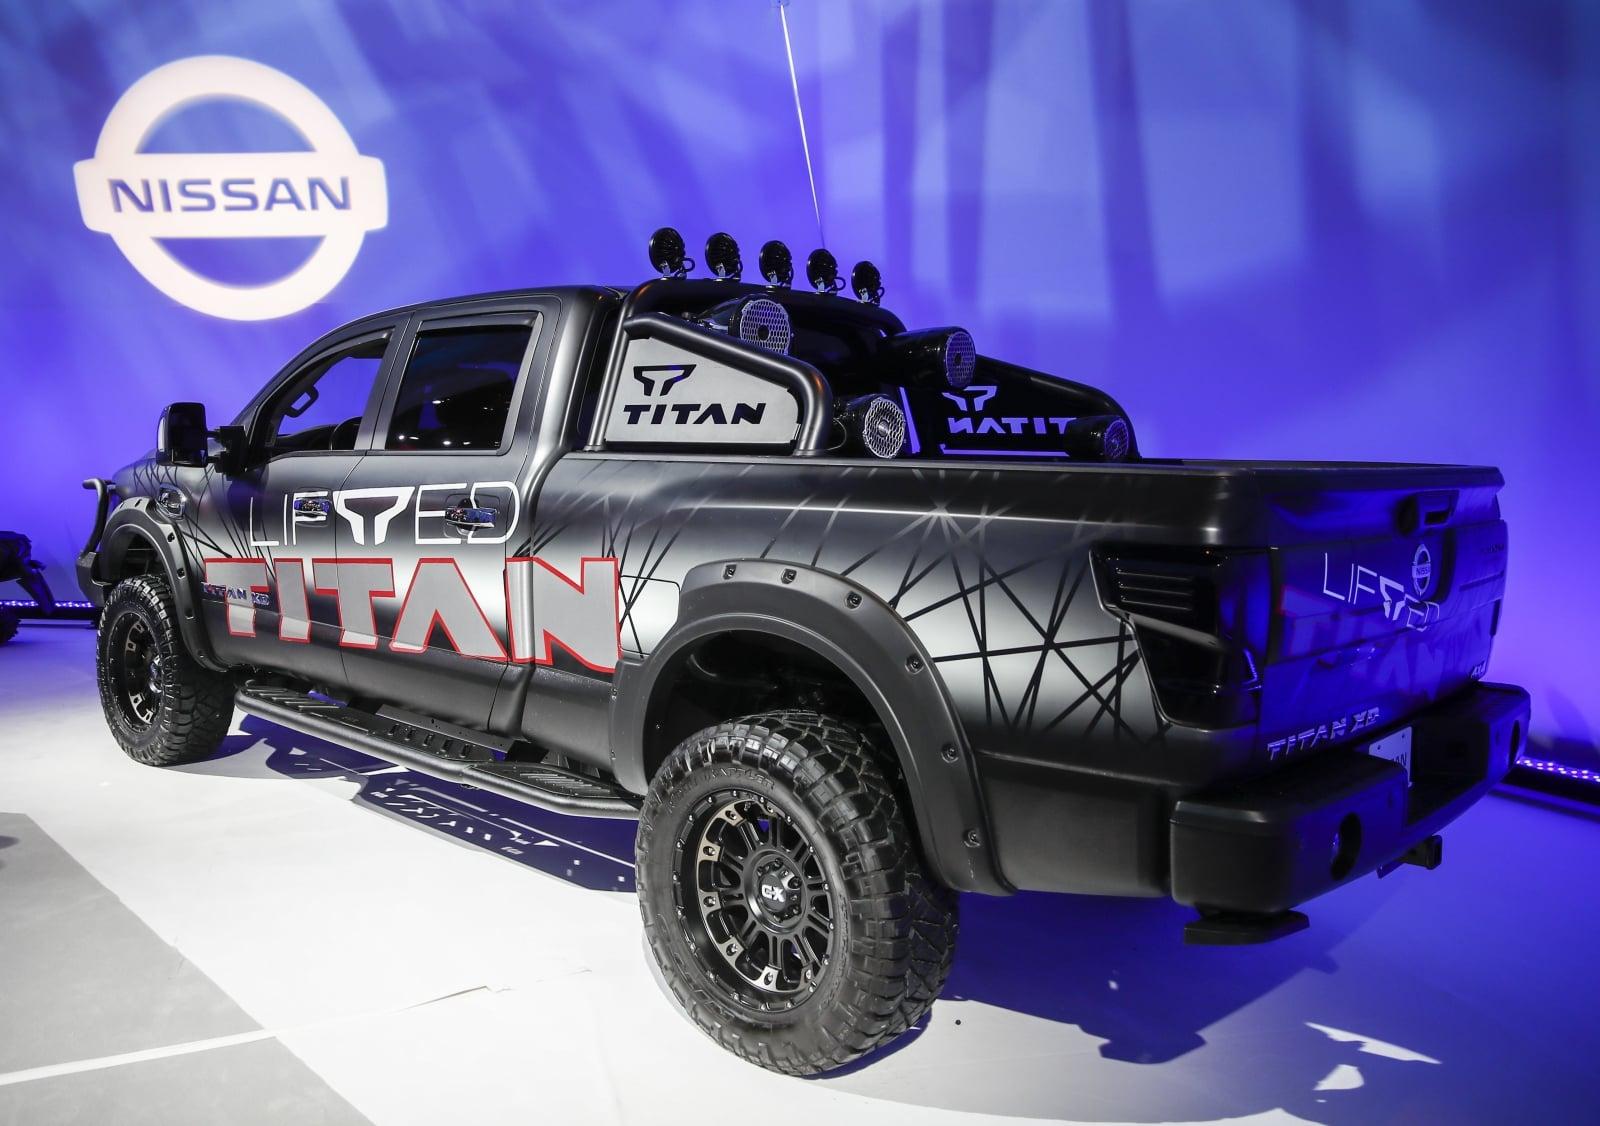 Auto Show w USA EPA/TANNEN MAURY